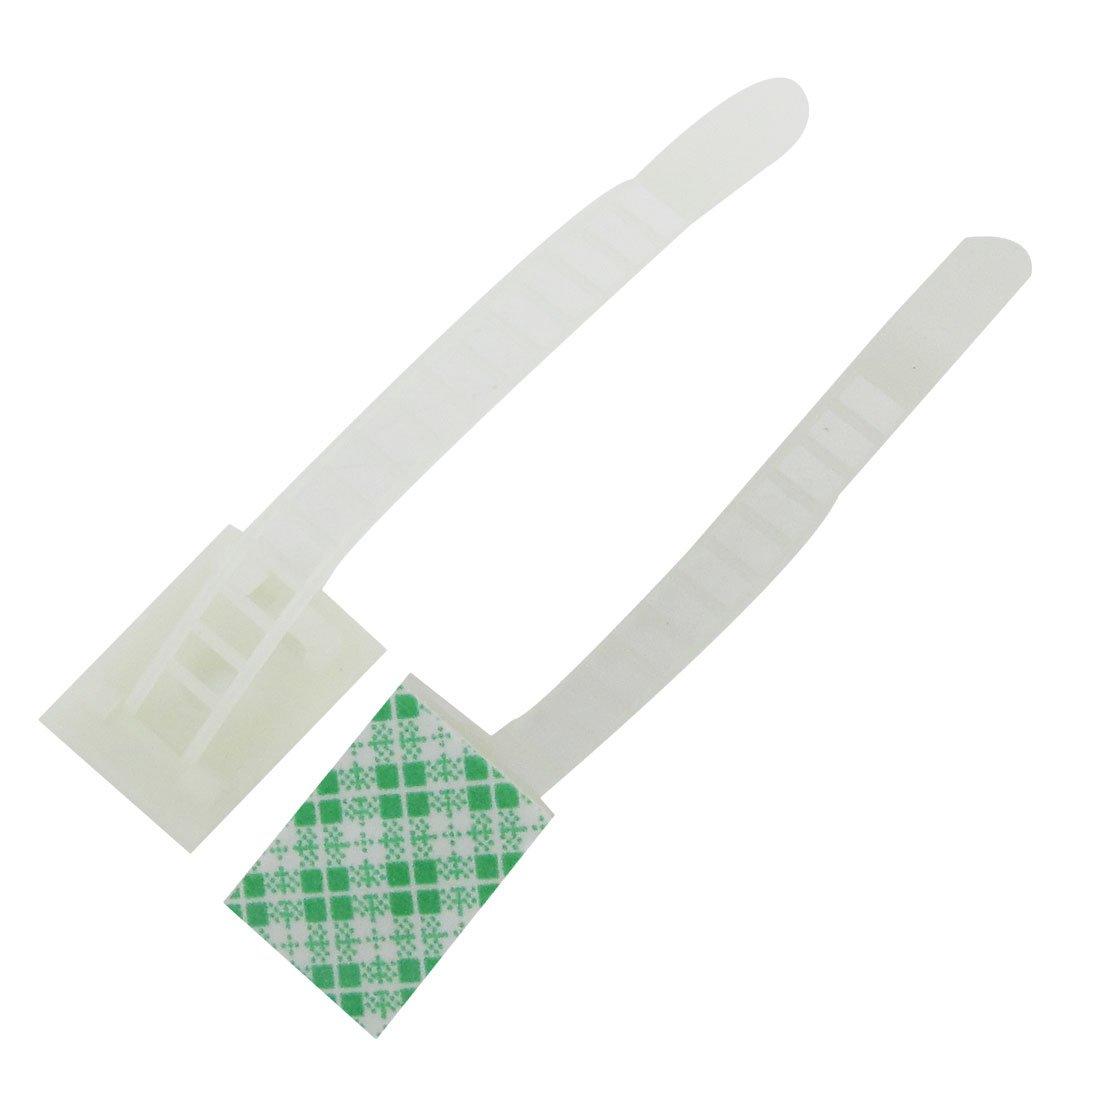 White Plastic ATC-17 Adjustable Cable Fixing Clip Holder 100 Pcs